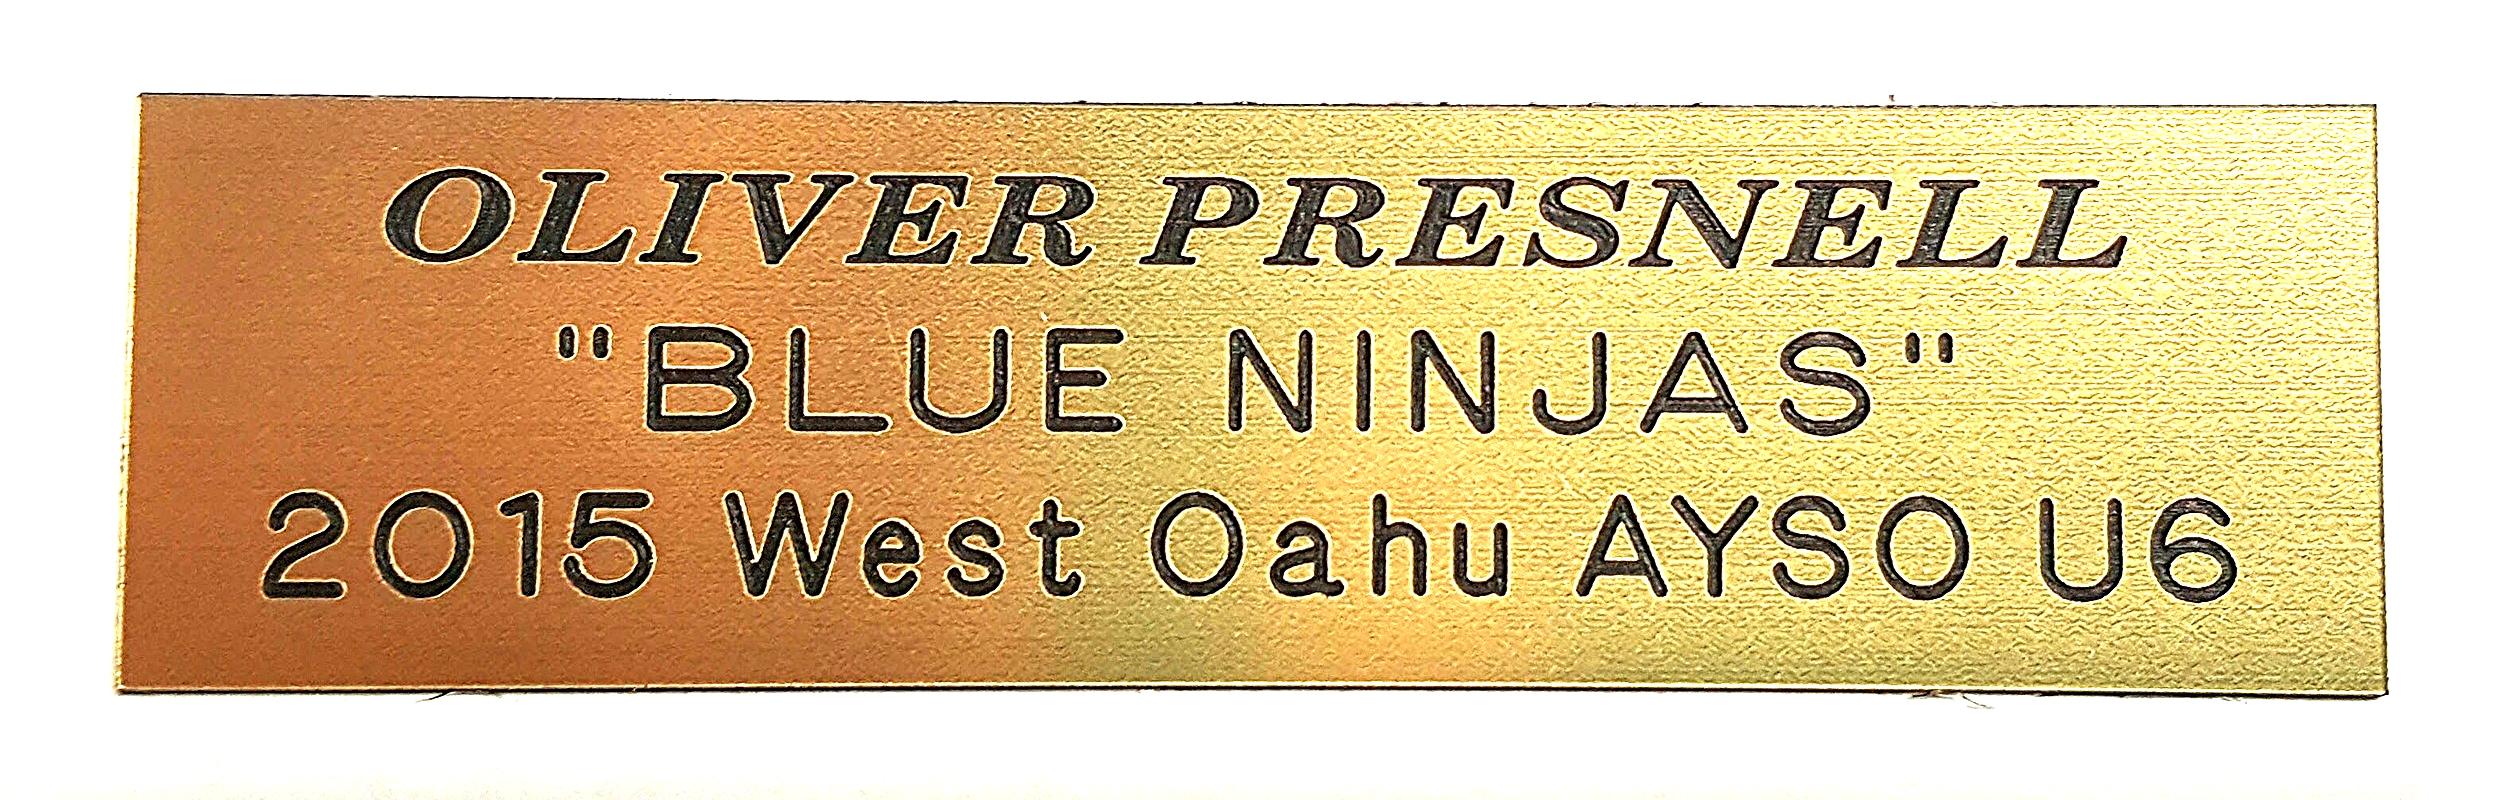 Trophy Engraving Plate Sample